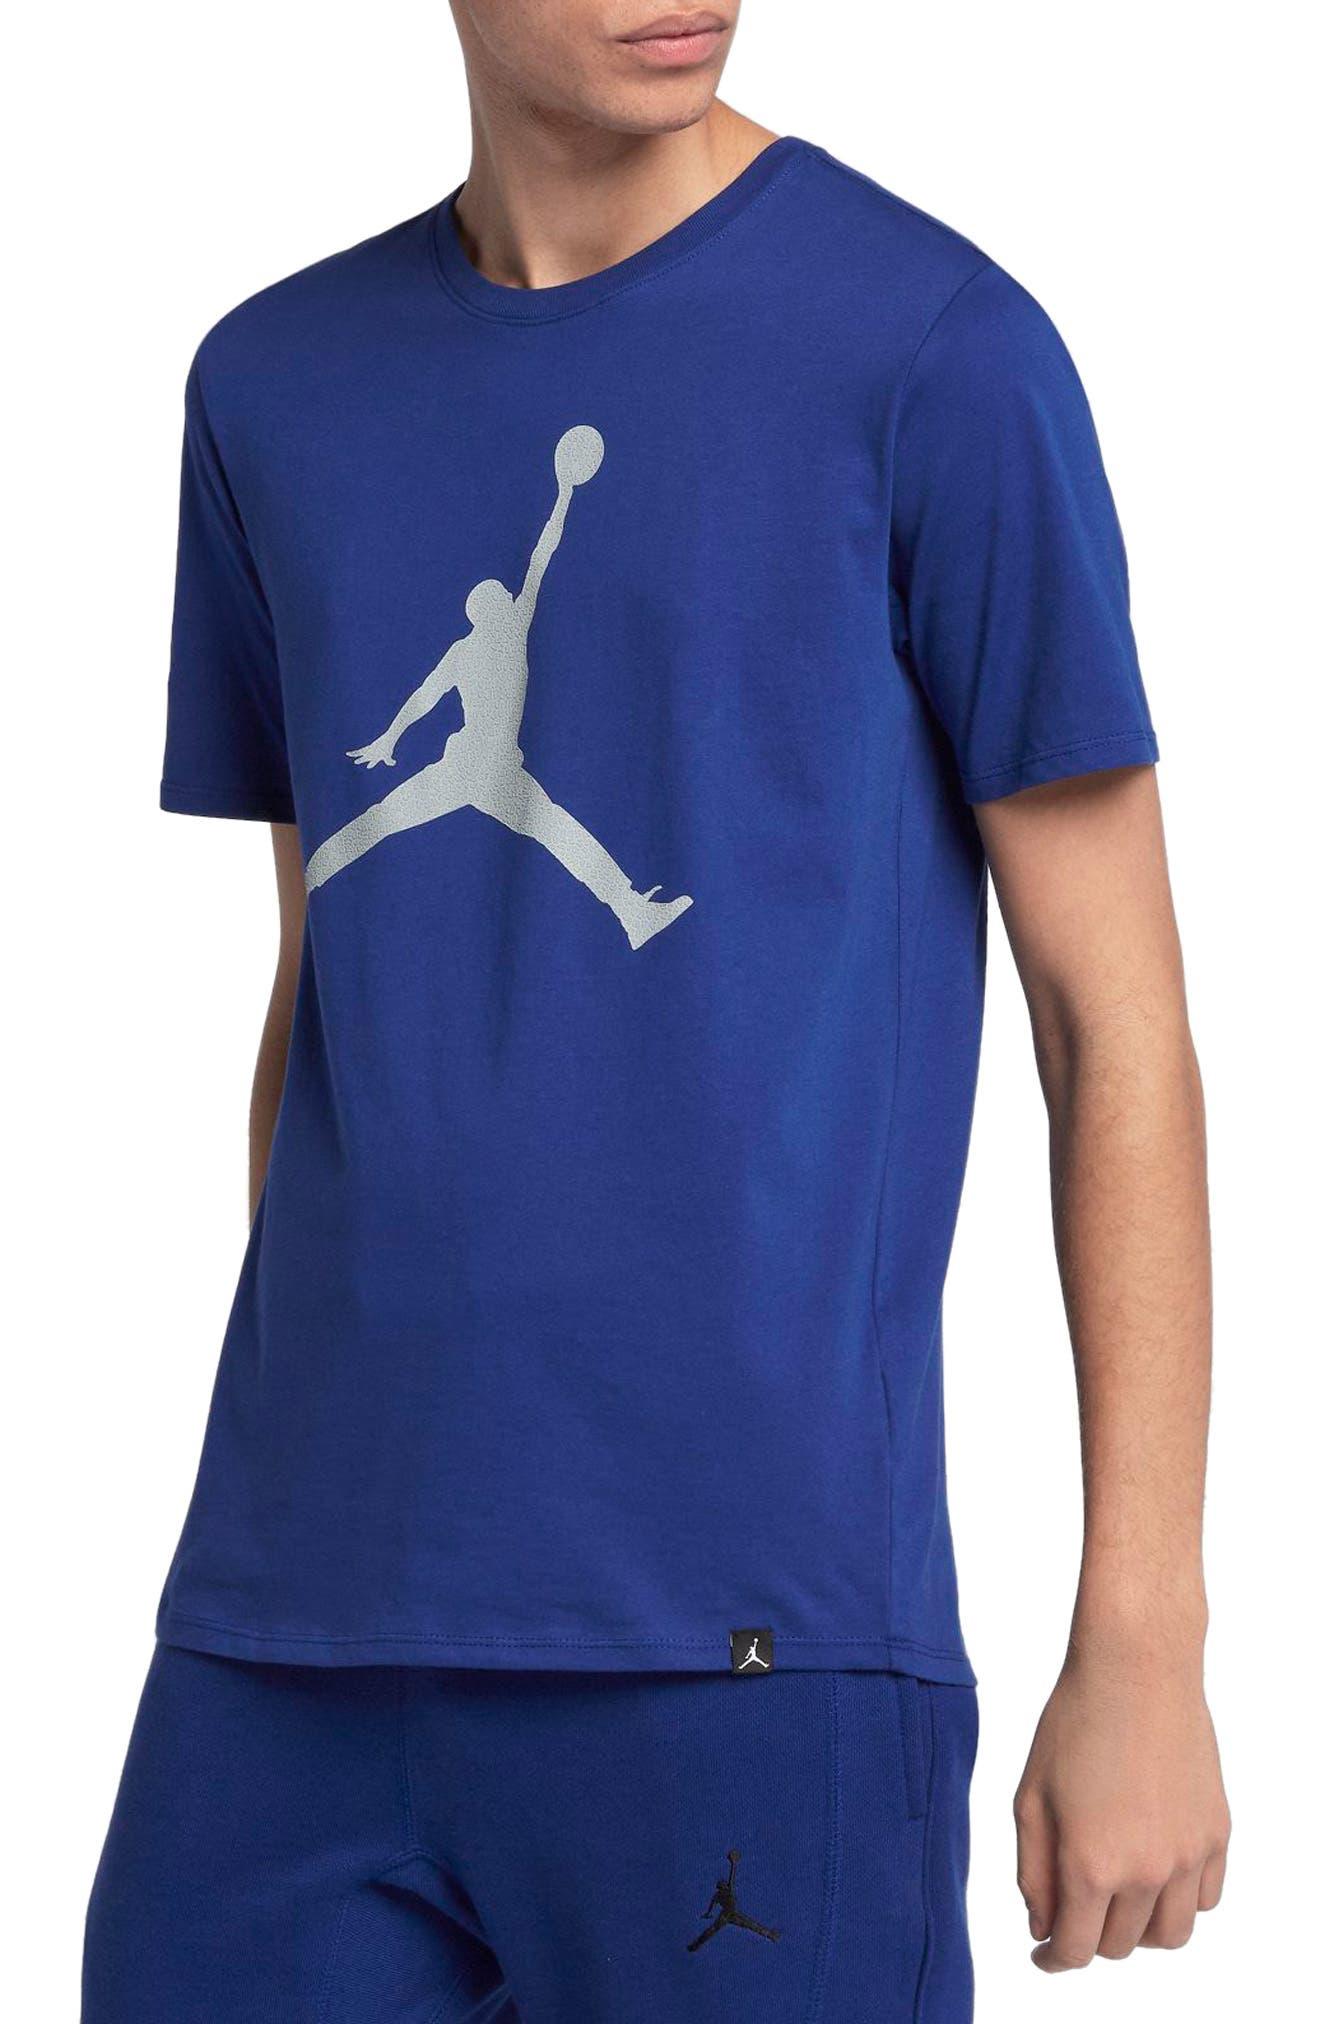 Sportswear Iconic Jumpman T-Shirt,                         Main,                         color, Deep Royal Blue/ Wolf Grey